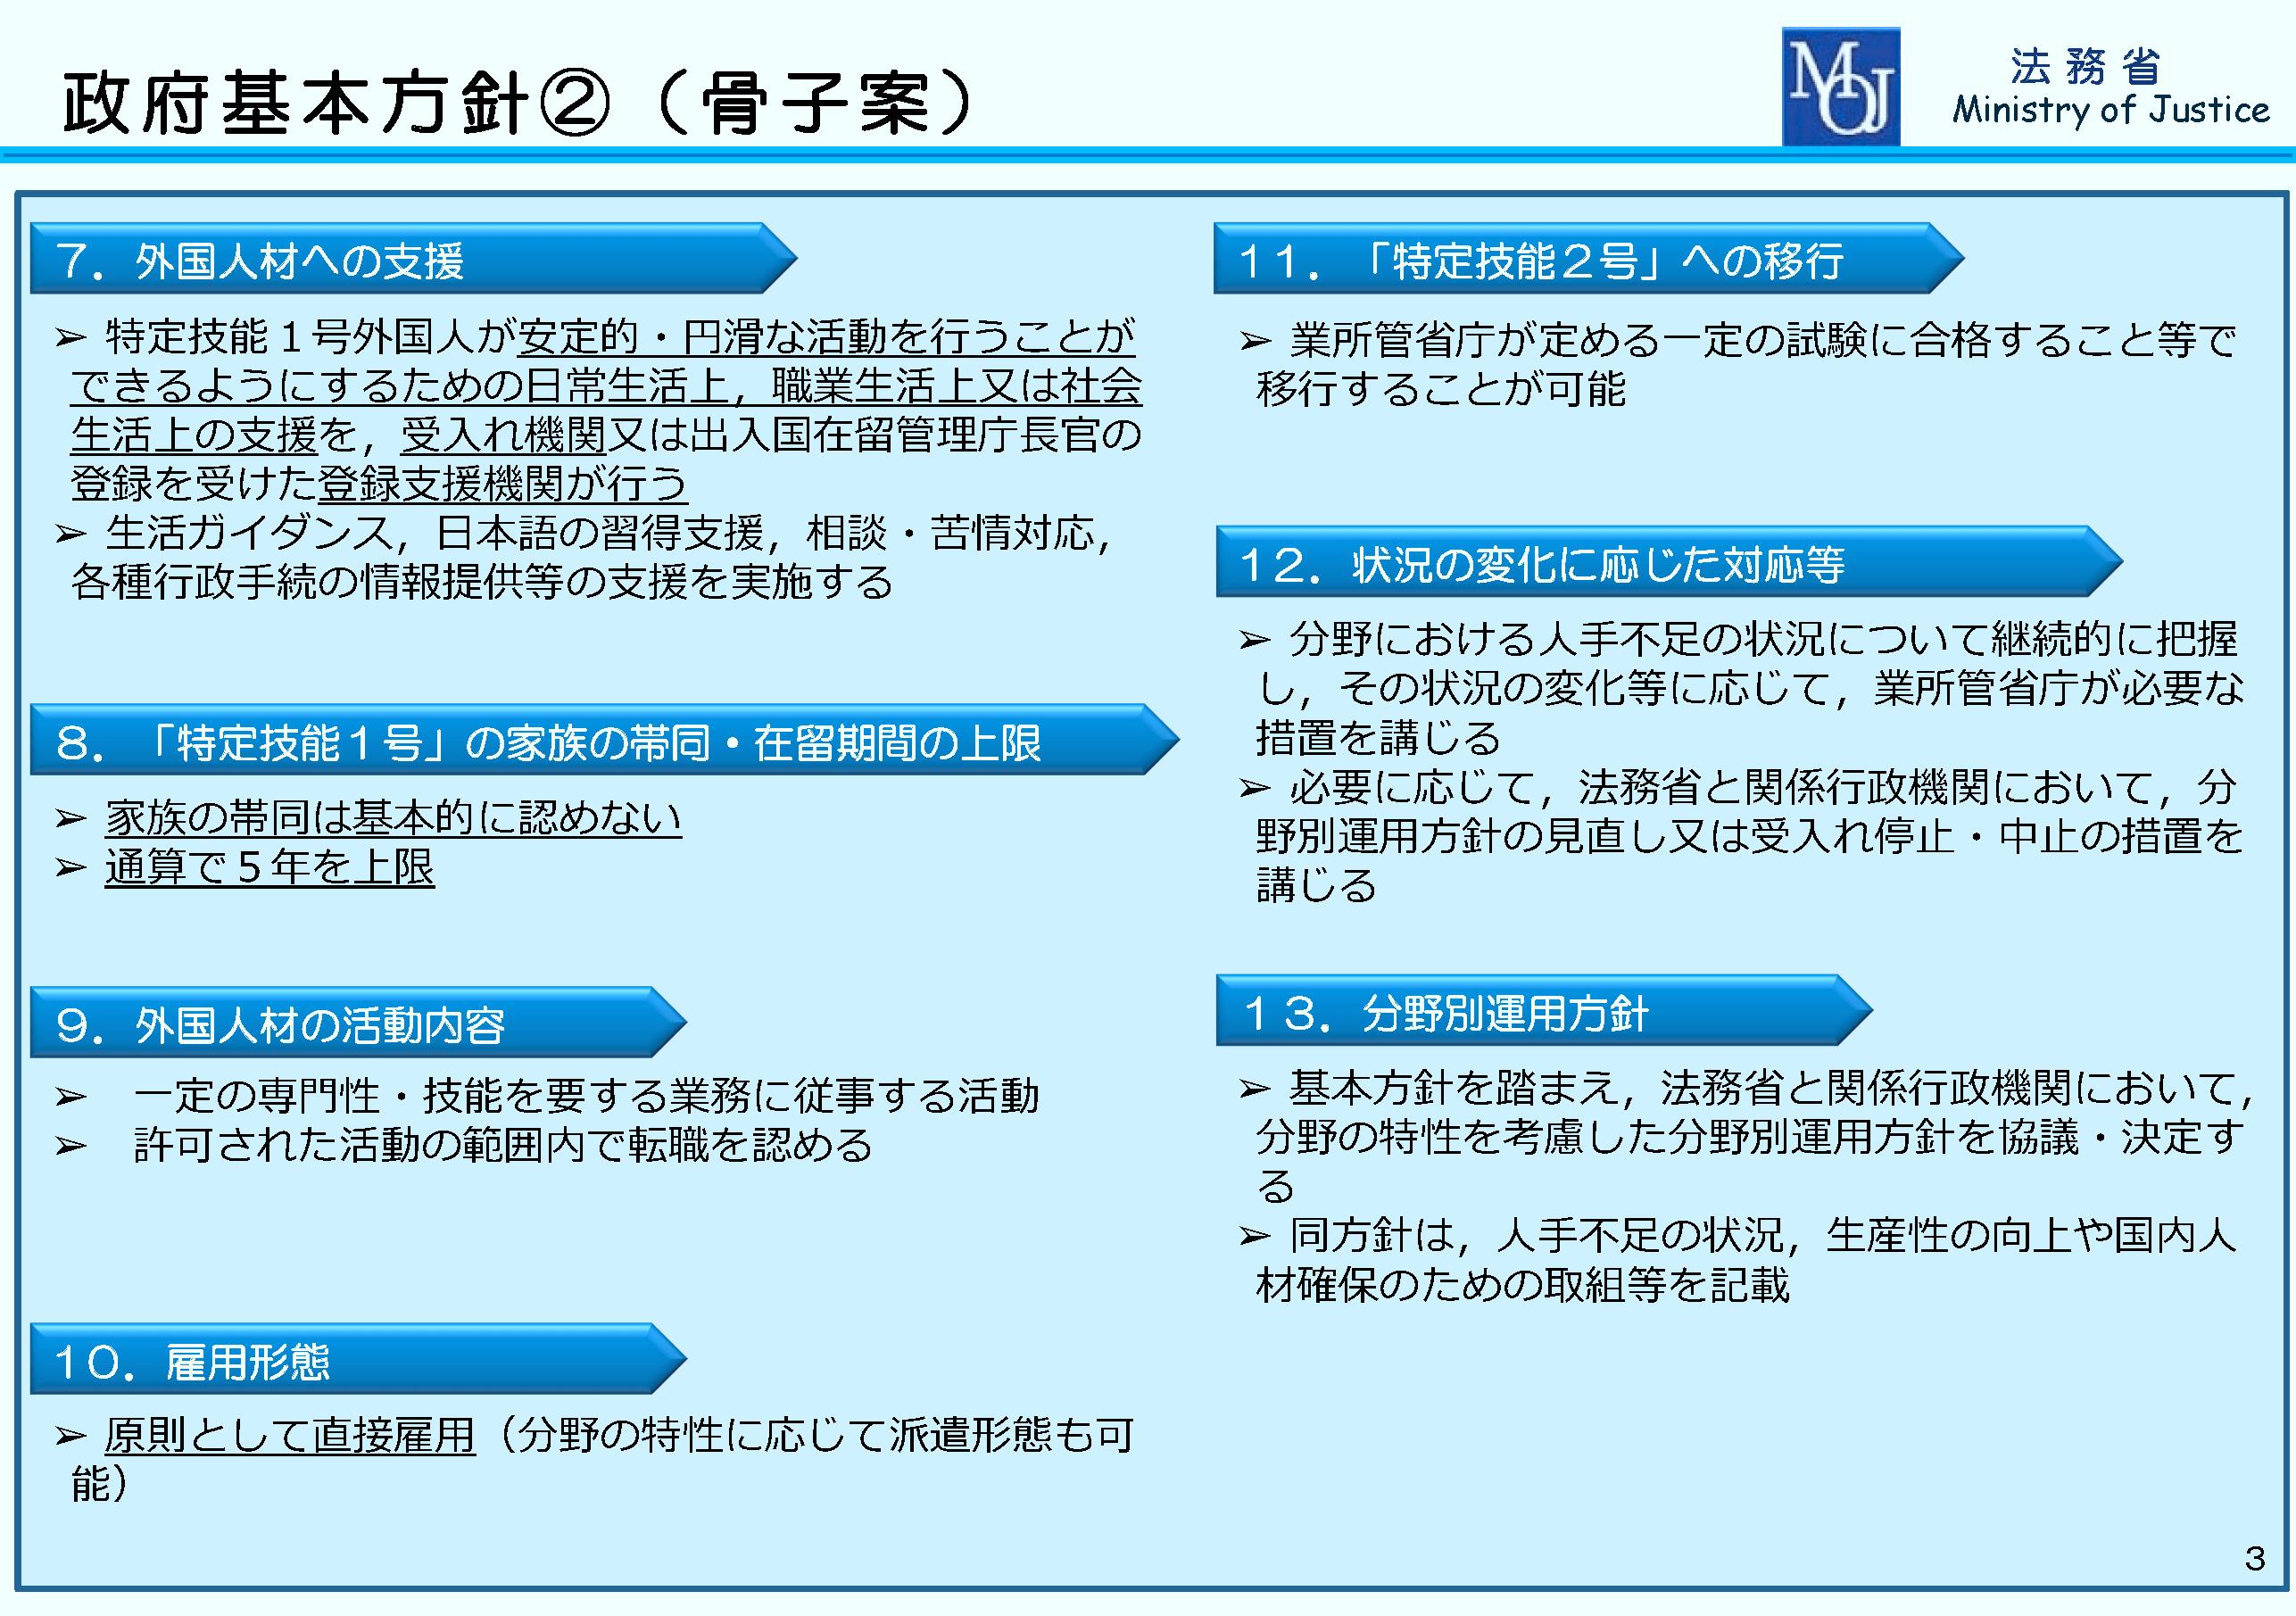 特定技能ビザ(在留資格)資料2-4